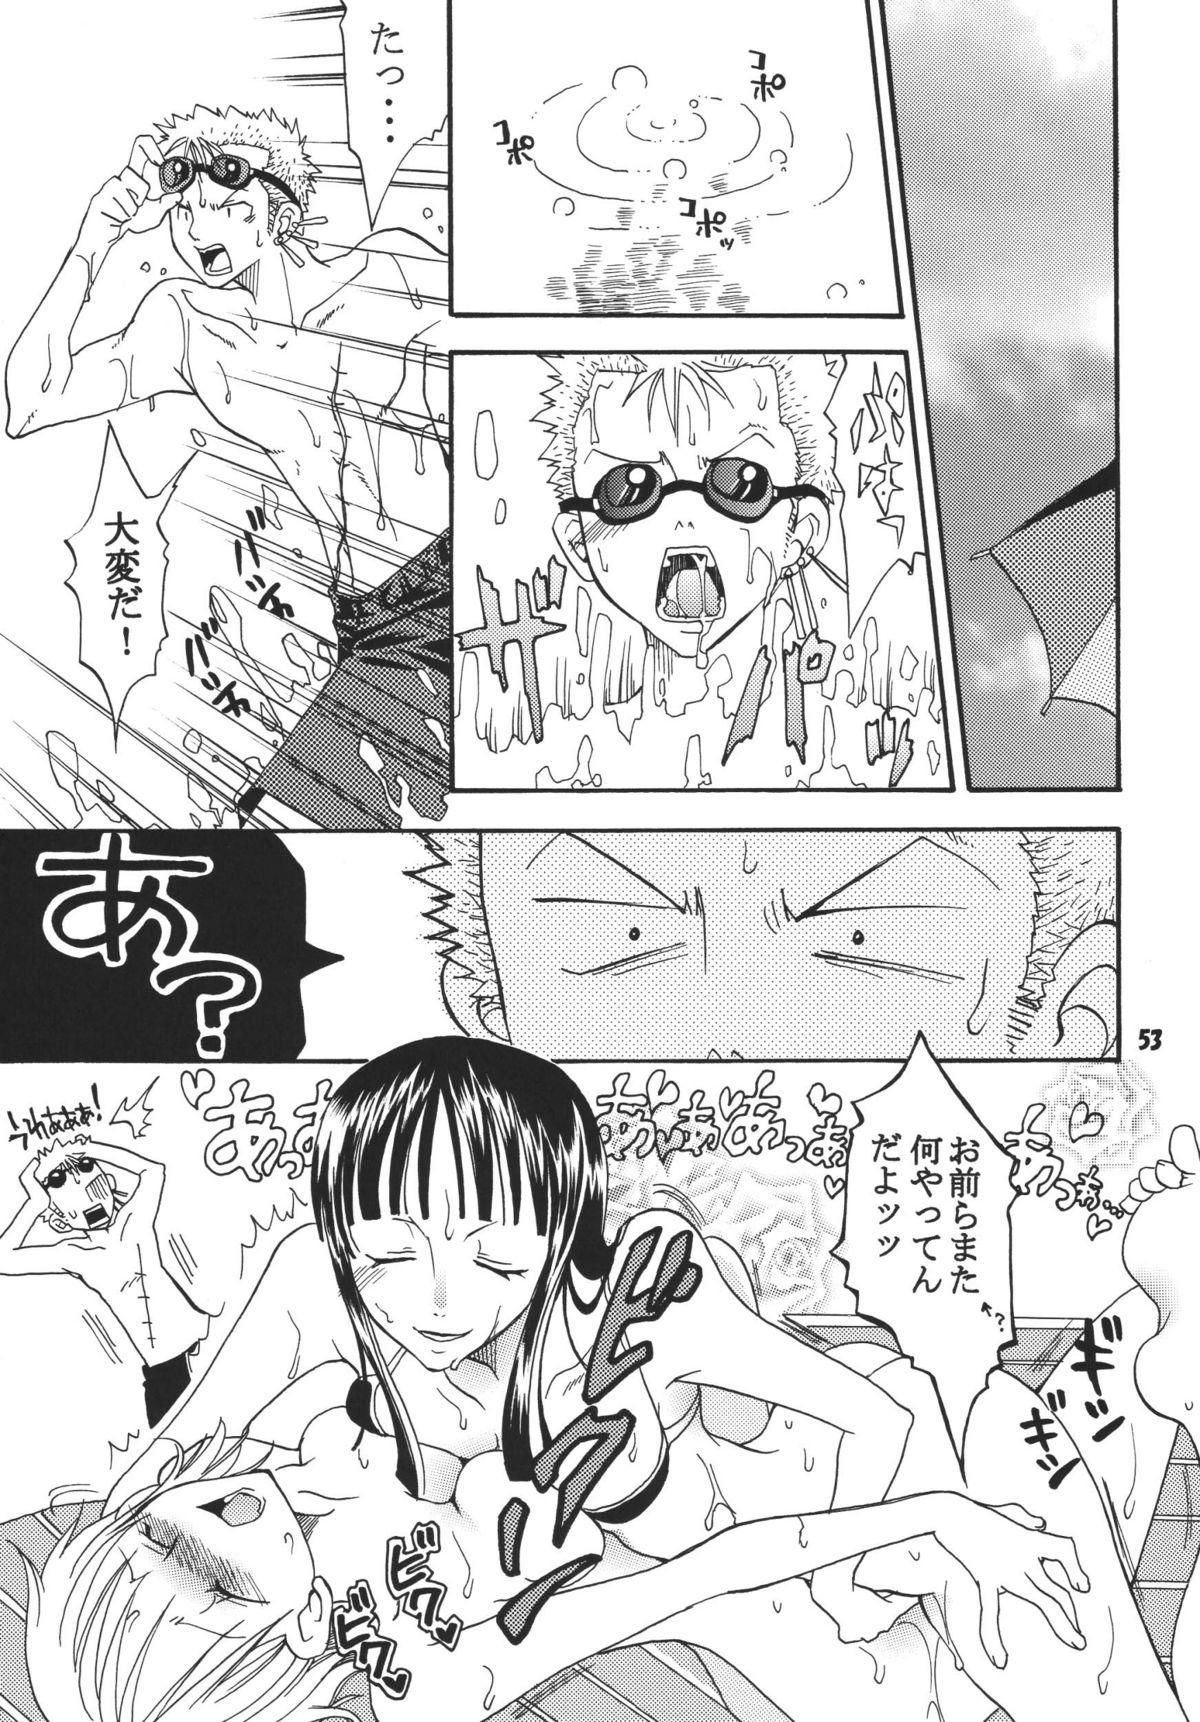 Kaizoku Musume. DX 51